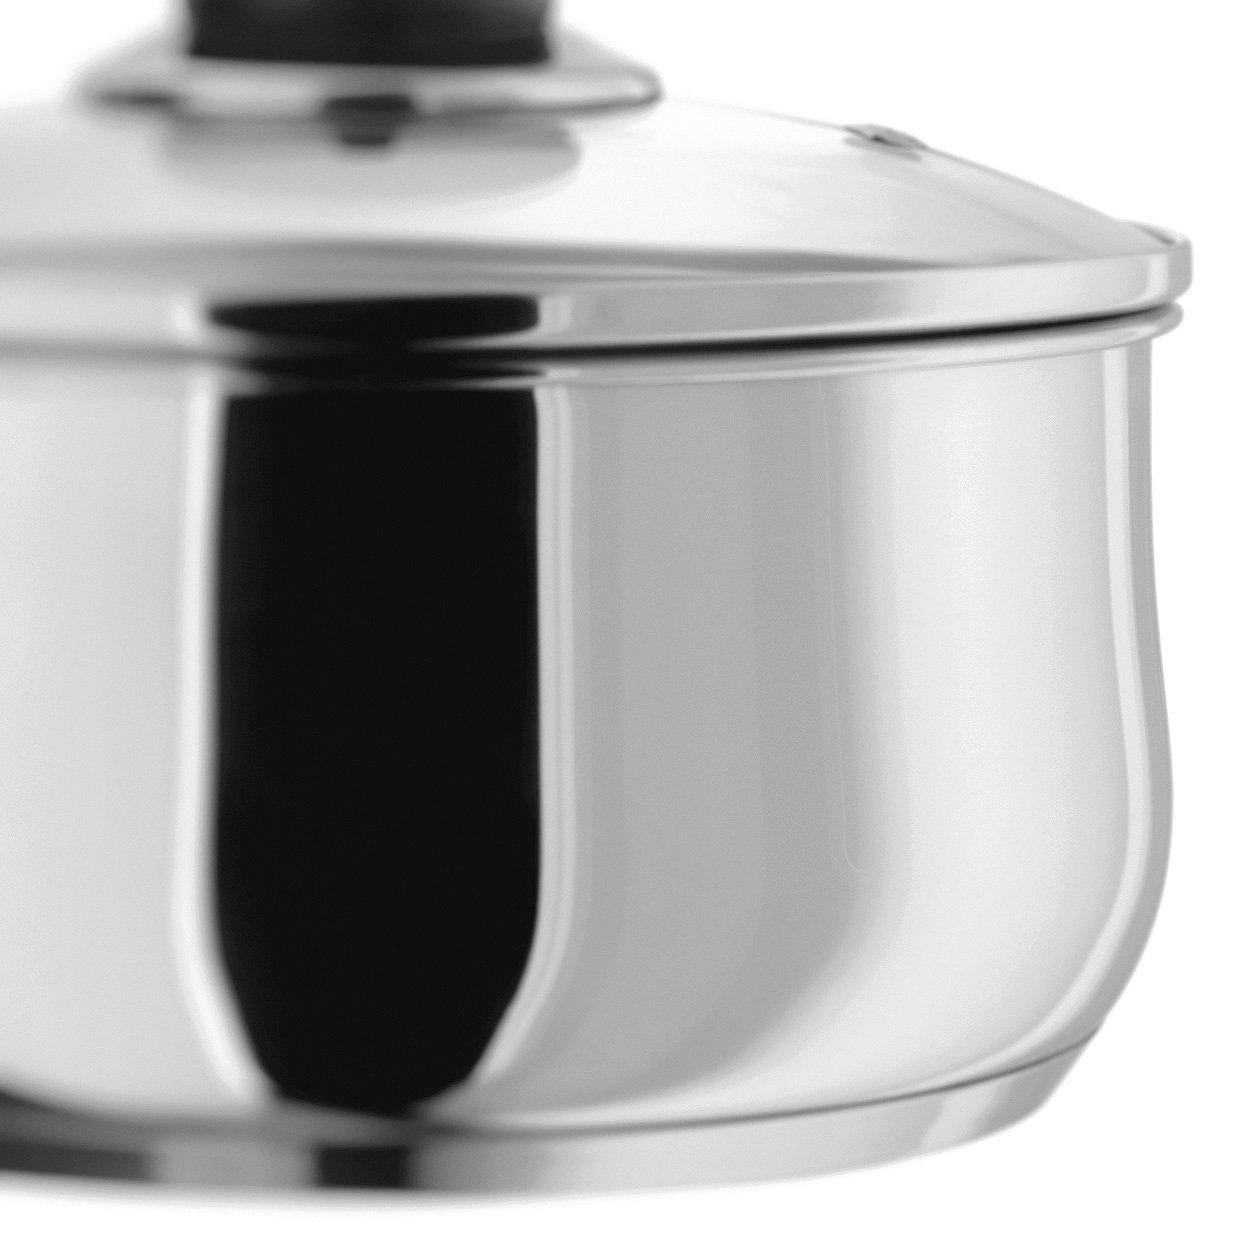 Judge Vista 18 10 Stainless Steel Egg Poacher 4 Cup 20cm